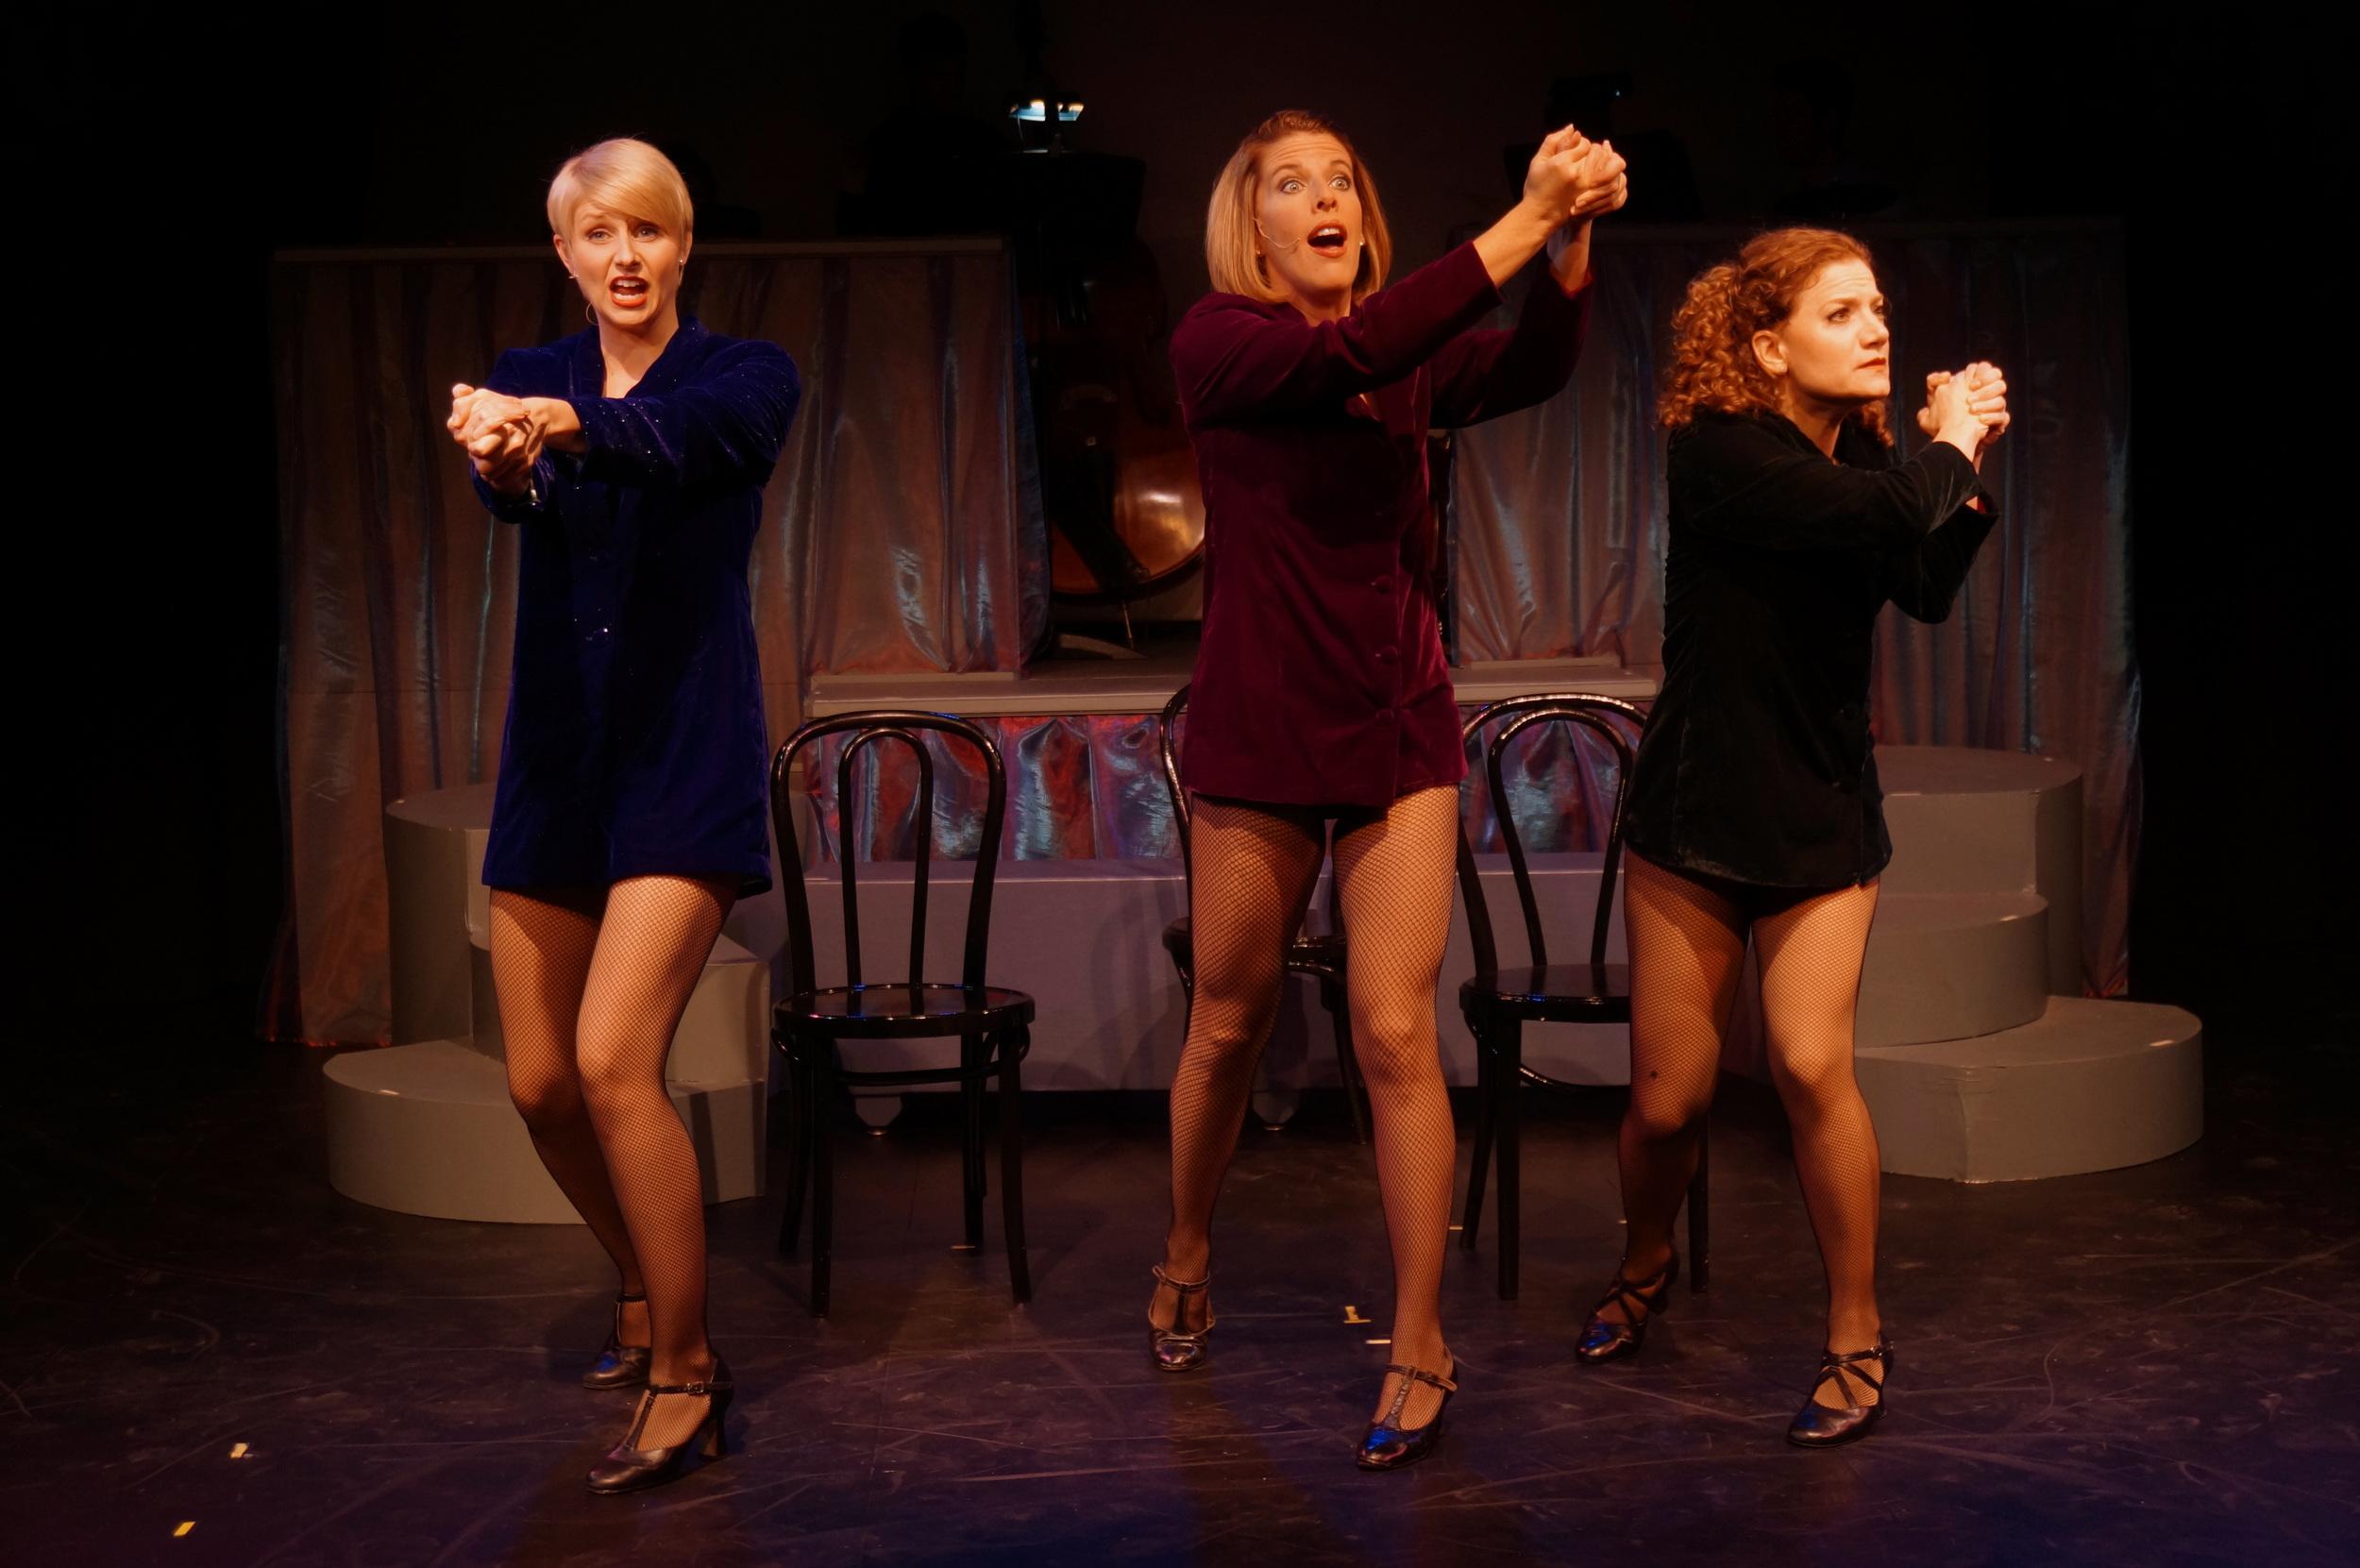 Melissa Carlile-Price, Trisha Rapier and Kathy Calahan